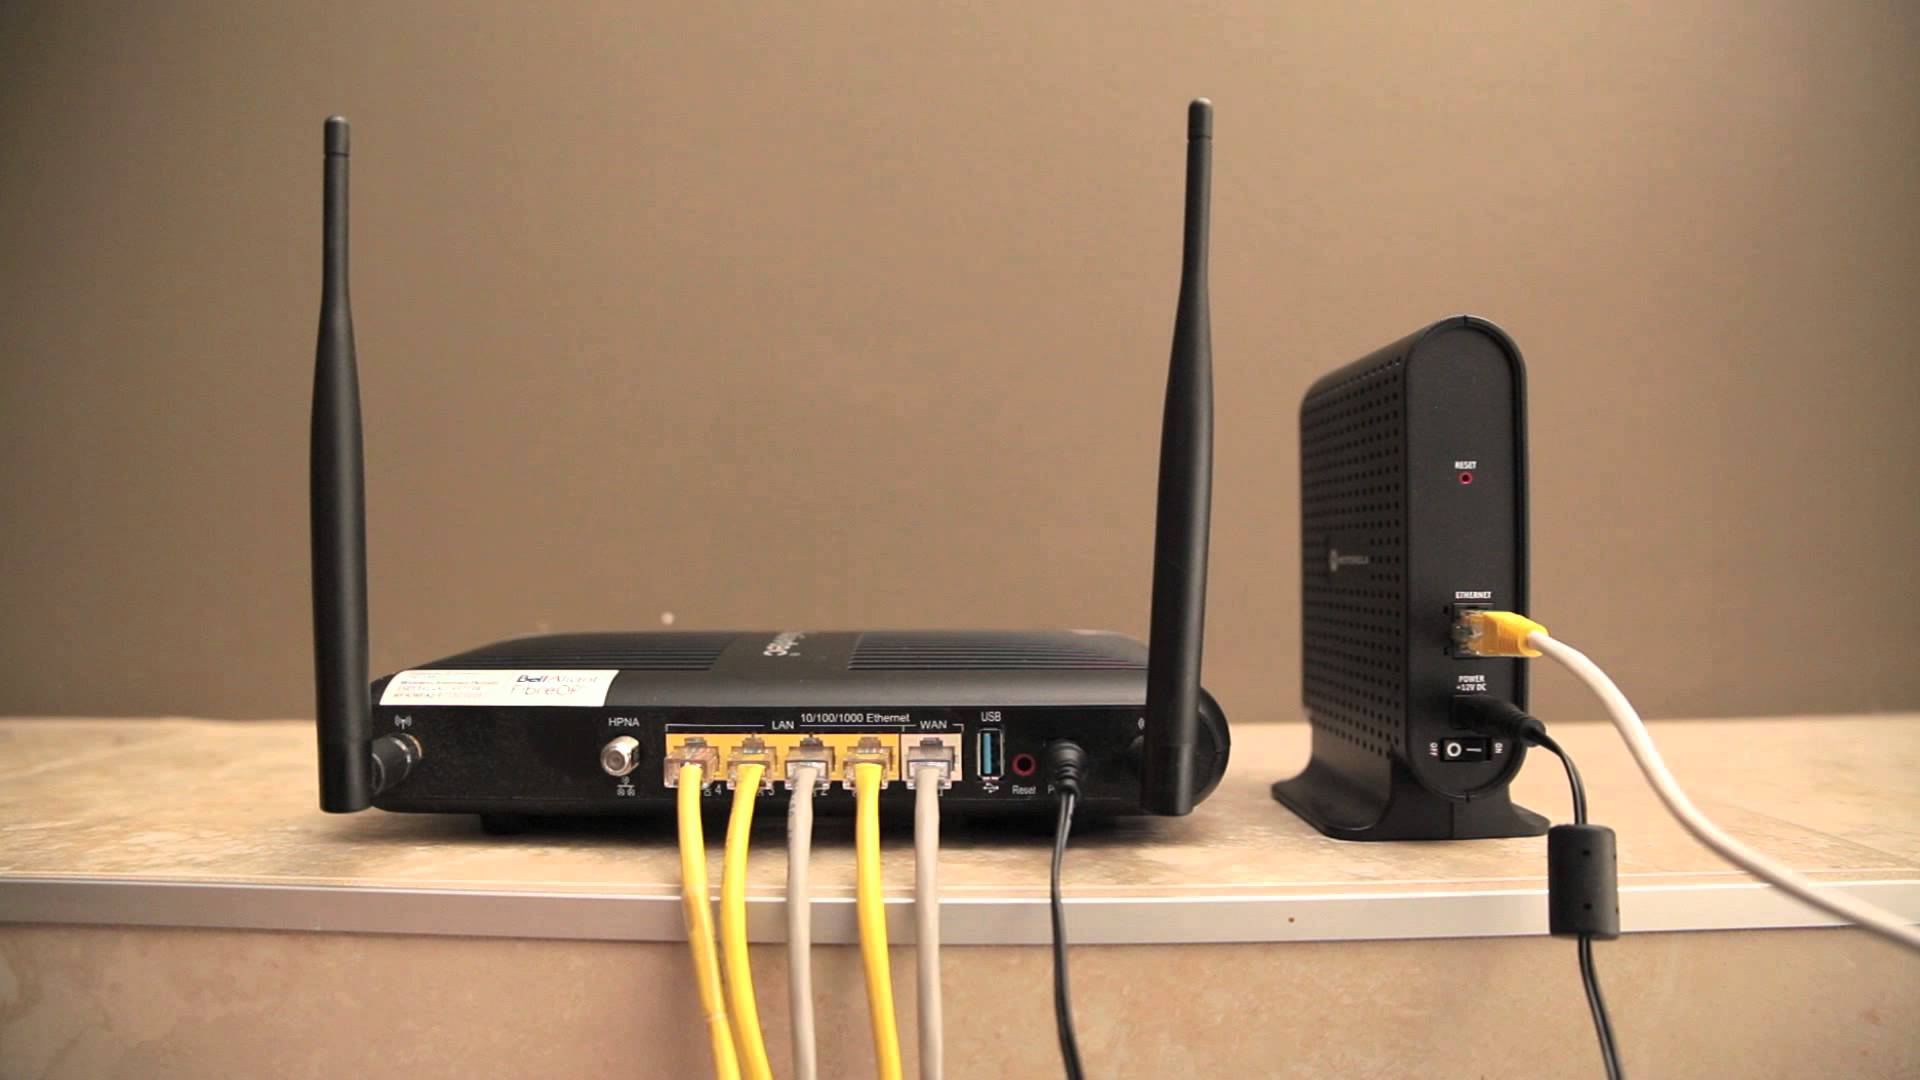 modem internet router comunicazione